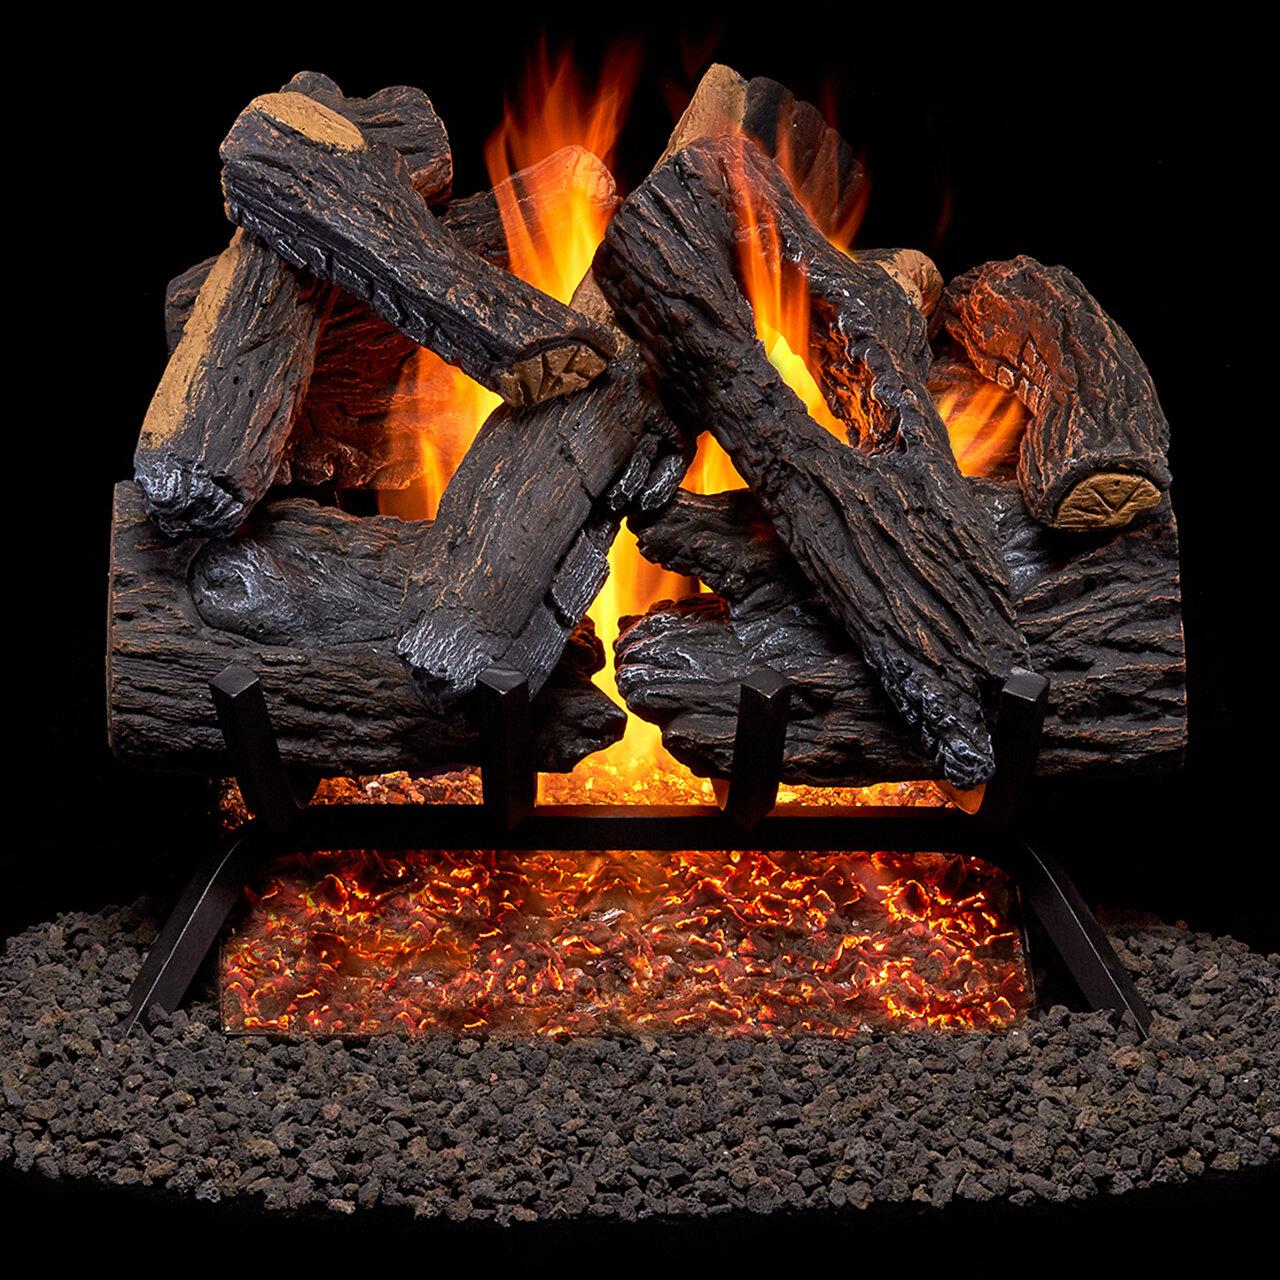 Duluth Forge Heartland Oak Vented Natural Gas Fireplace Log Set